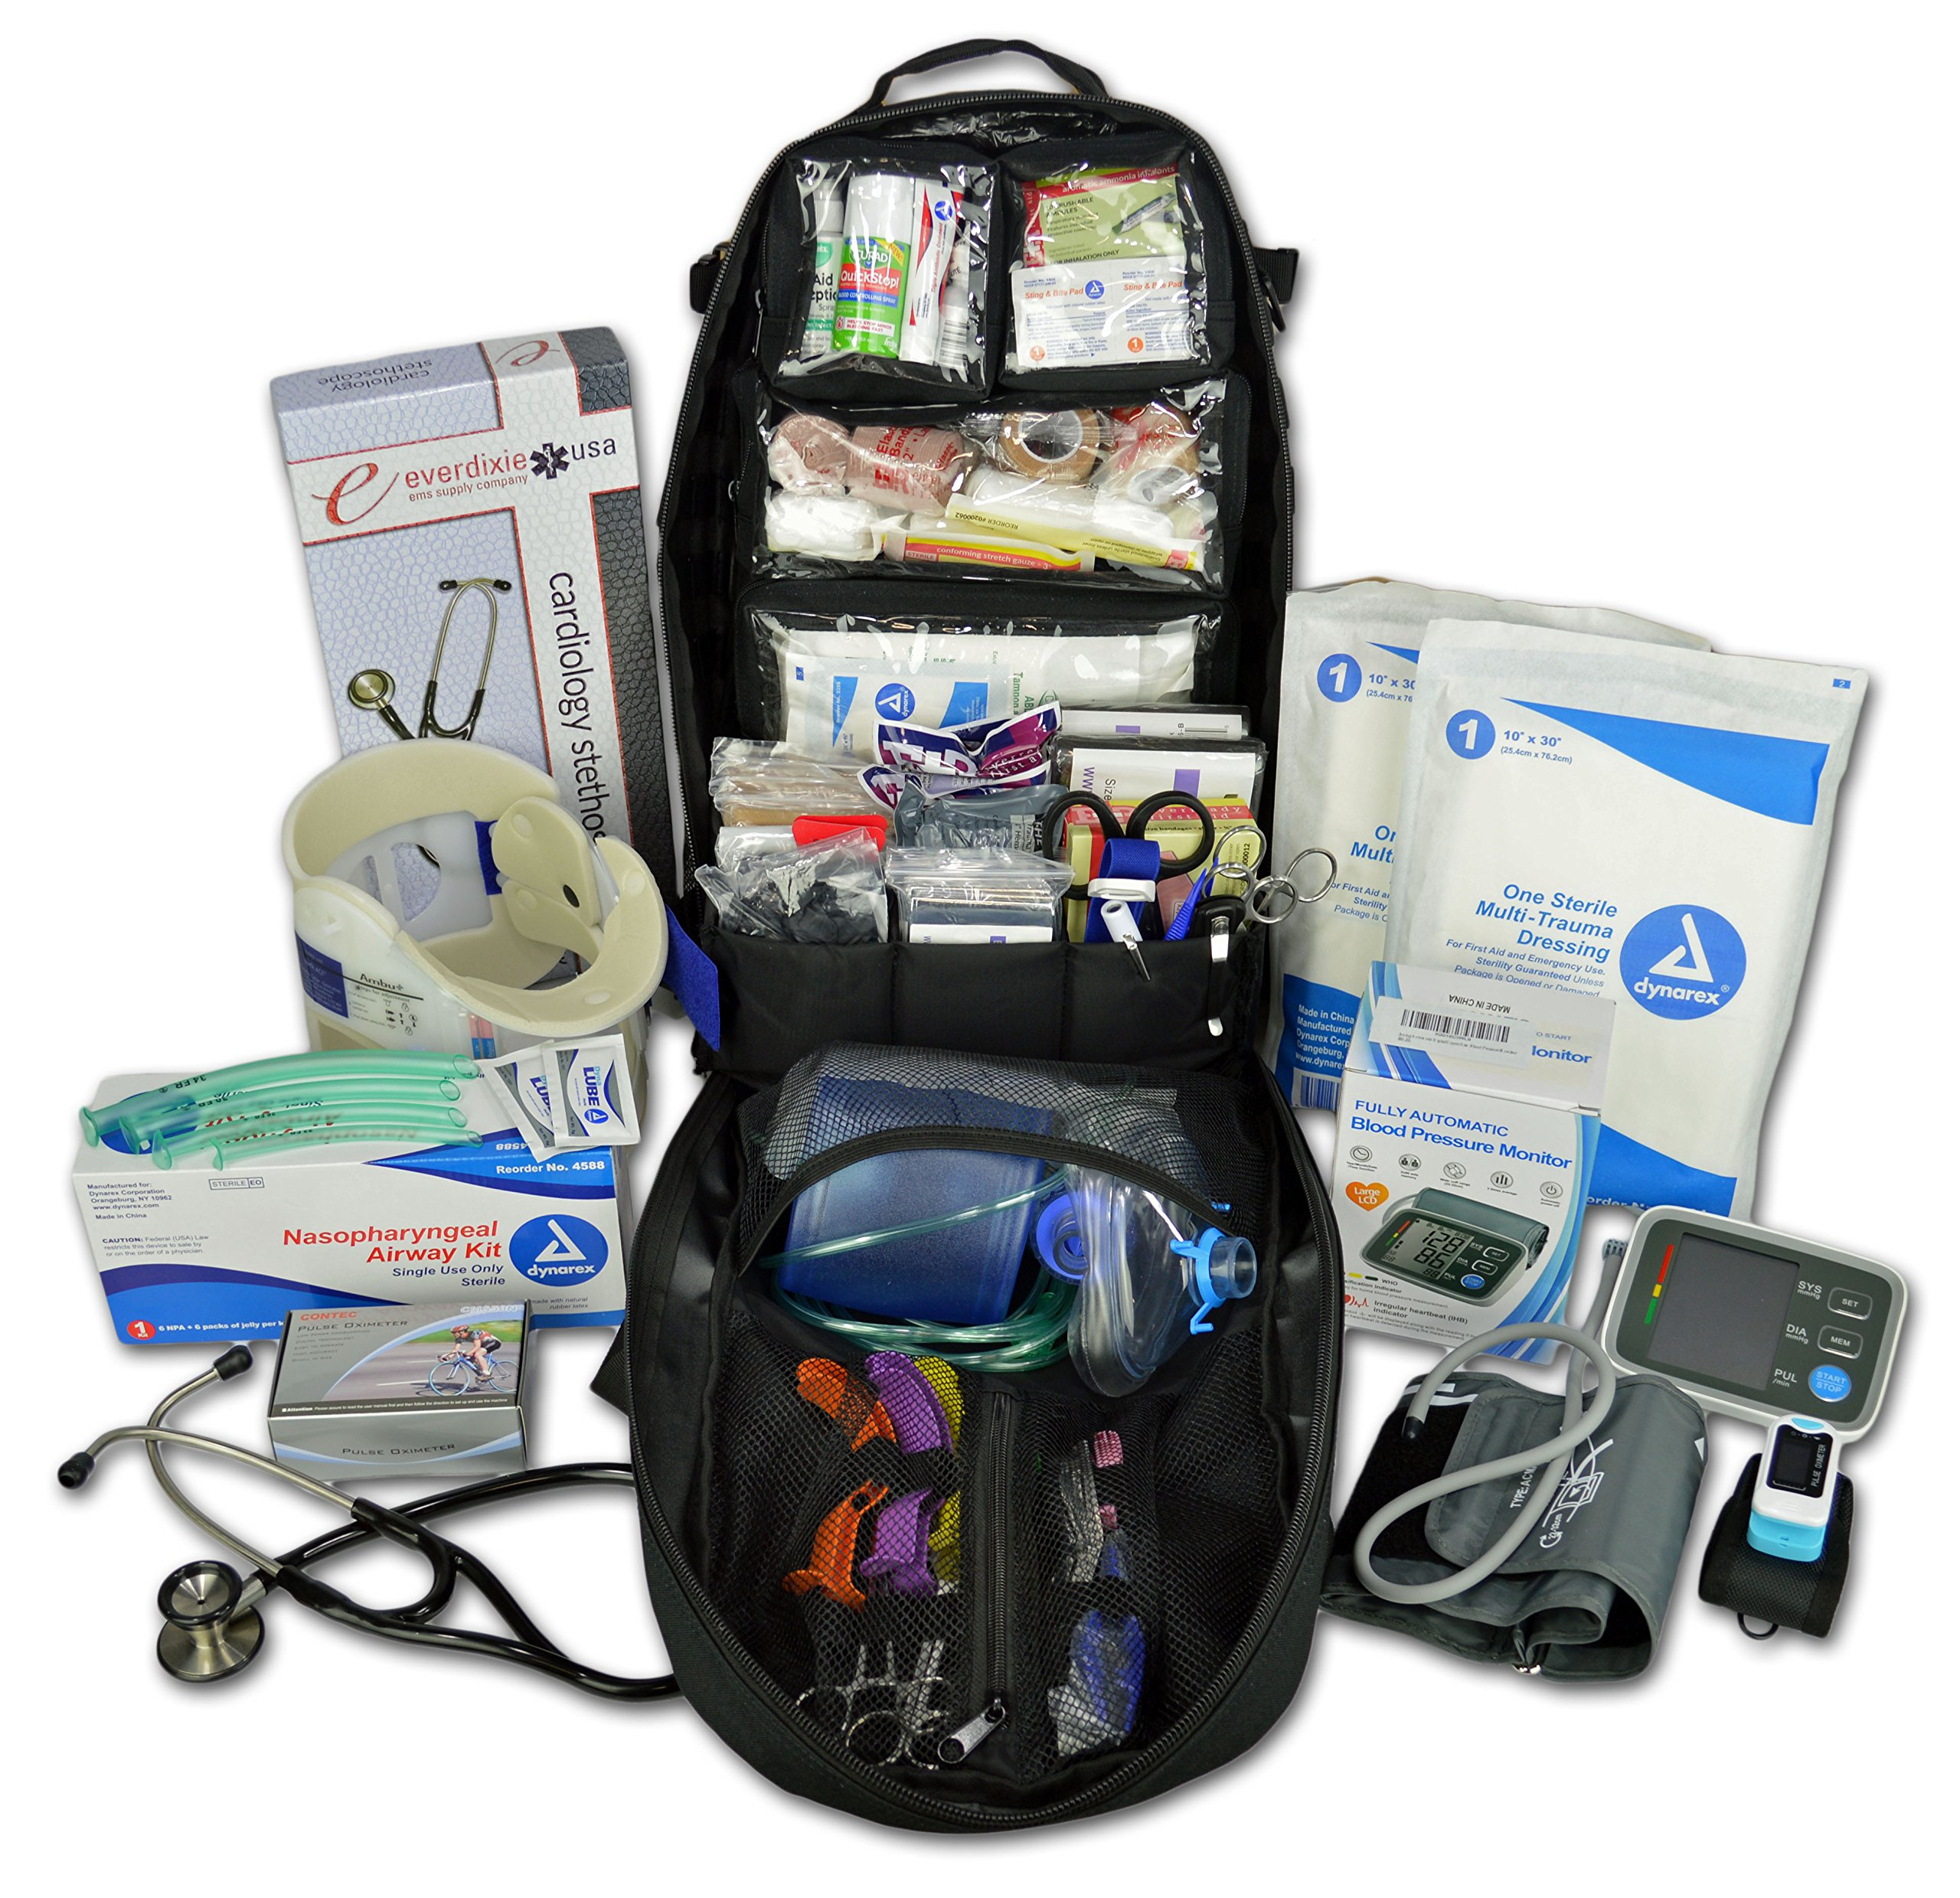 Lightning X Premium Stocked Tactical EMS/EMT Trauma First Aid Responder Medical Kit Backpack - Black